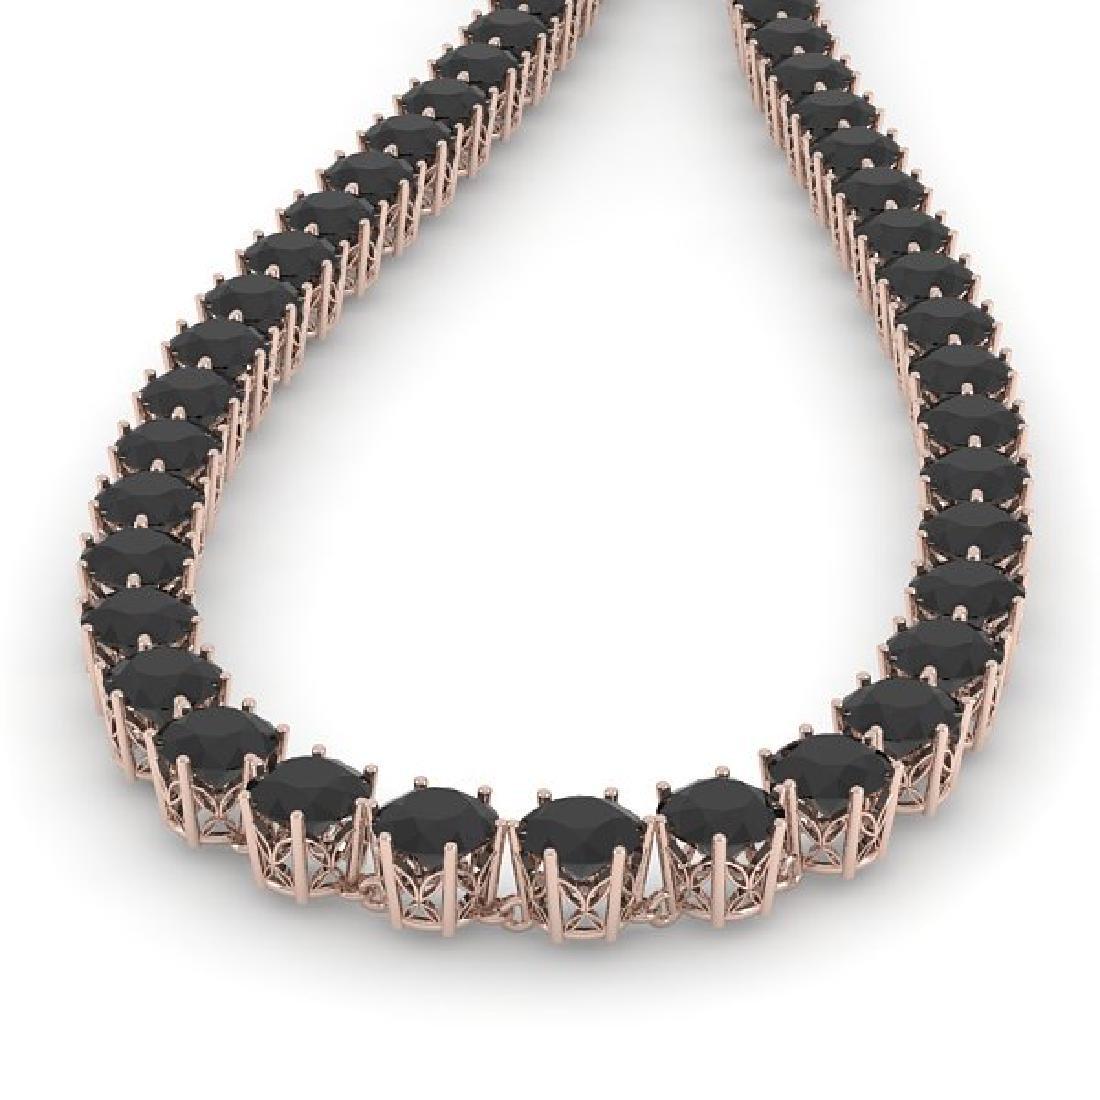 36 CTW Certified Black VS Diamond Necklace 18K Rose - 2